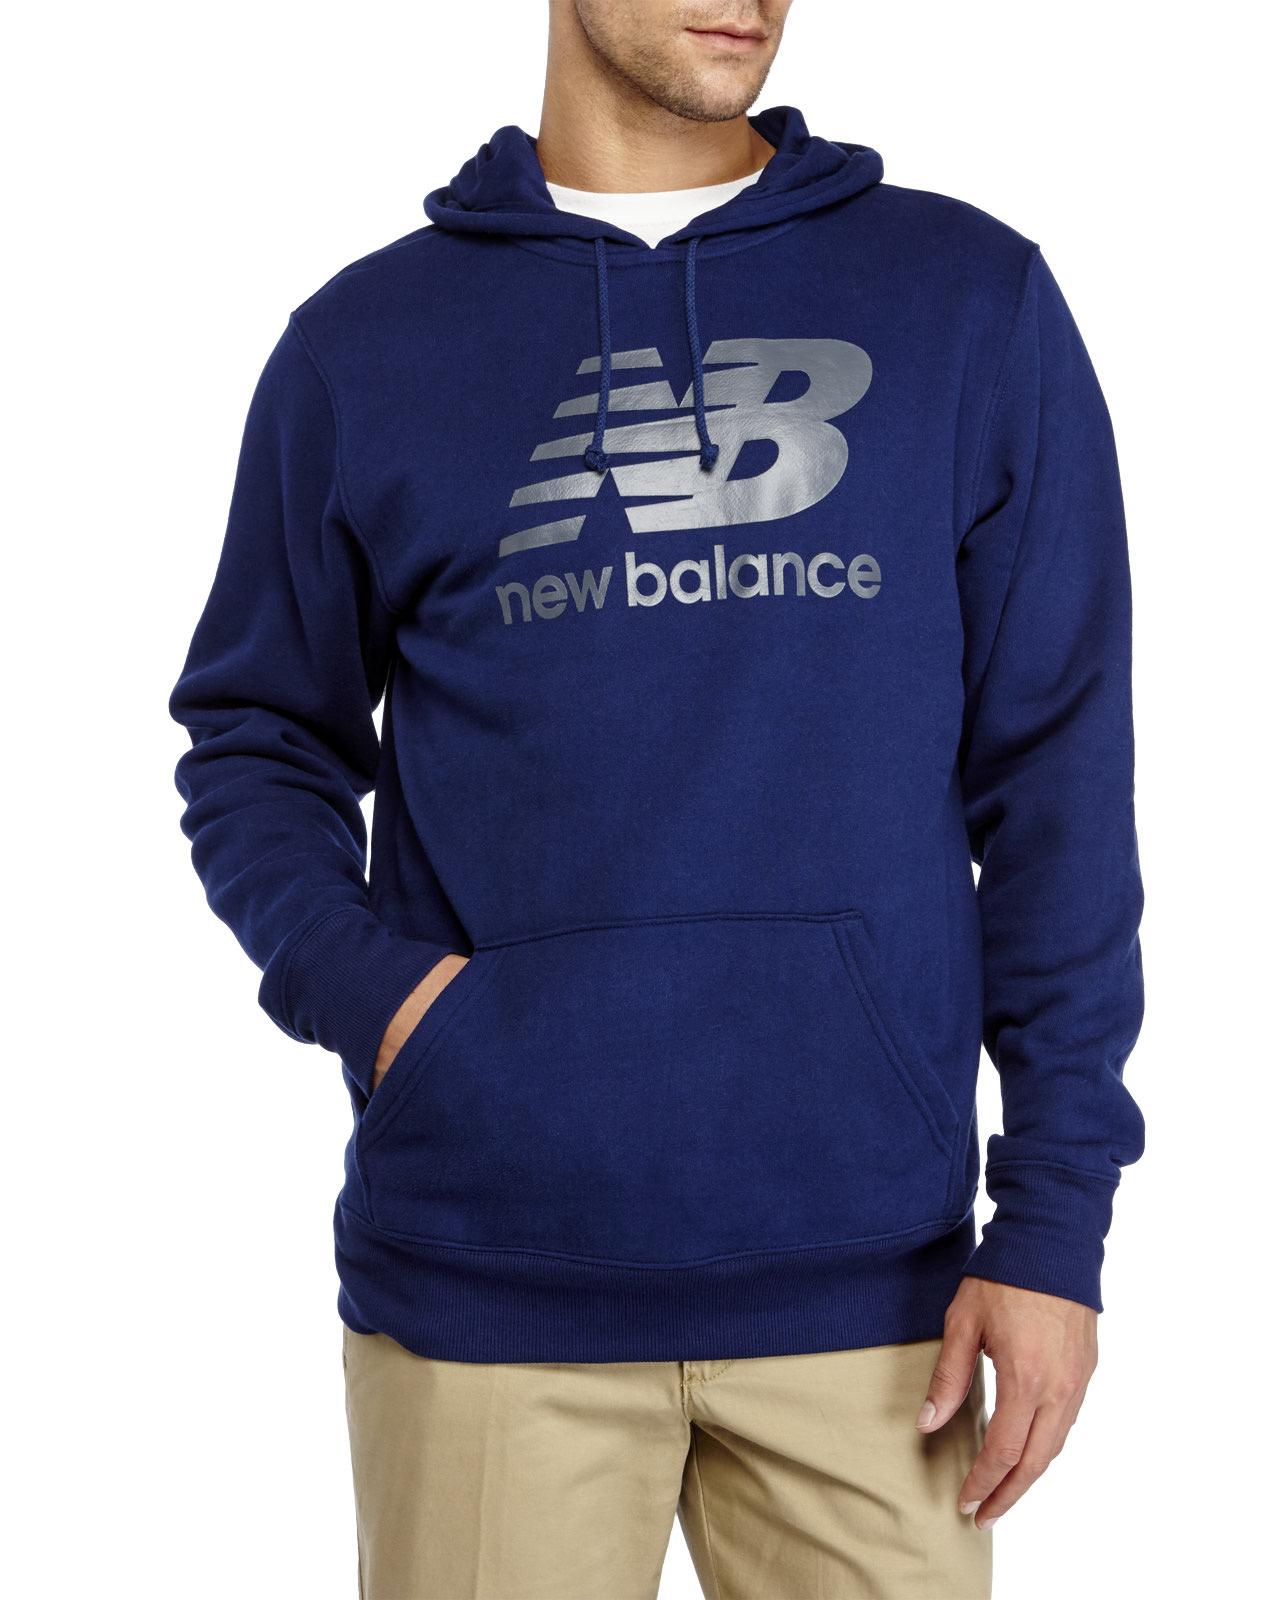 lyst new balance graphic logo hoodie in blue for men. Black Bedroom Furniture Sets. Home Design Ideas